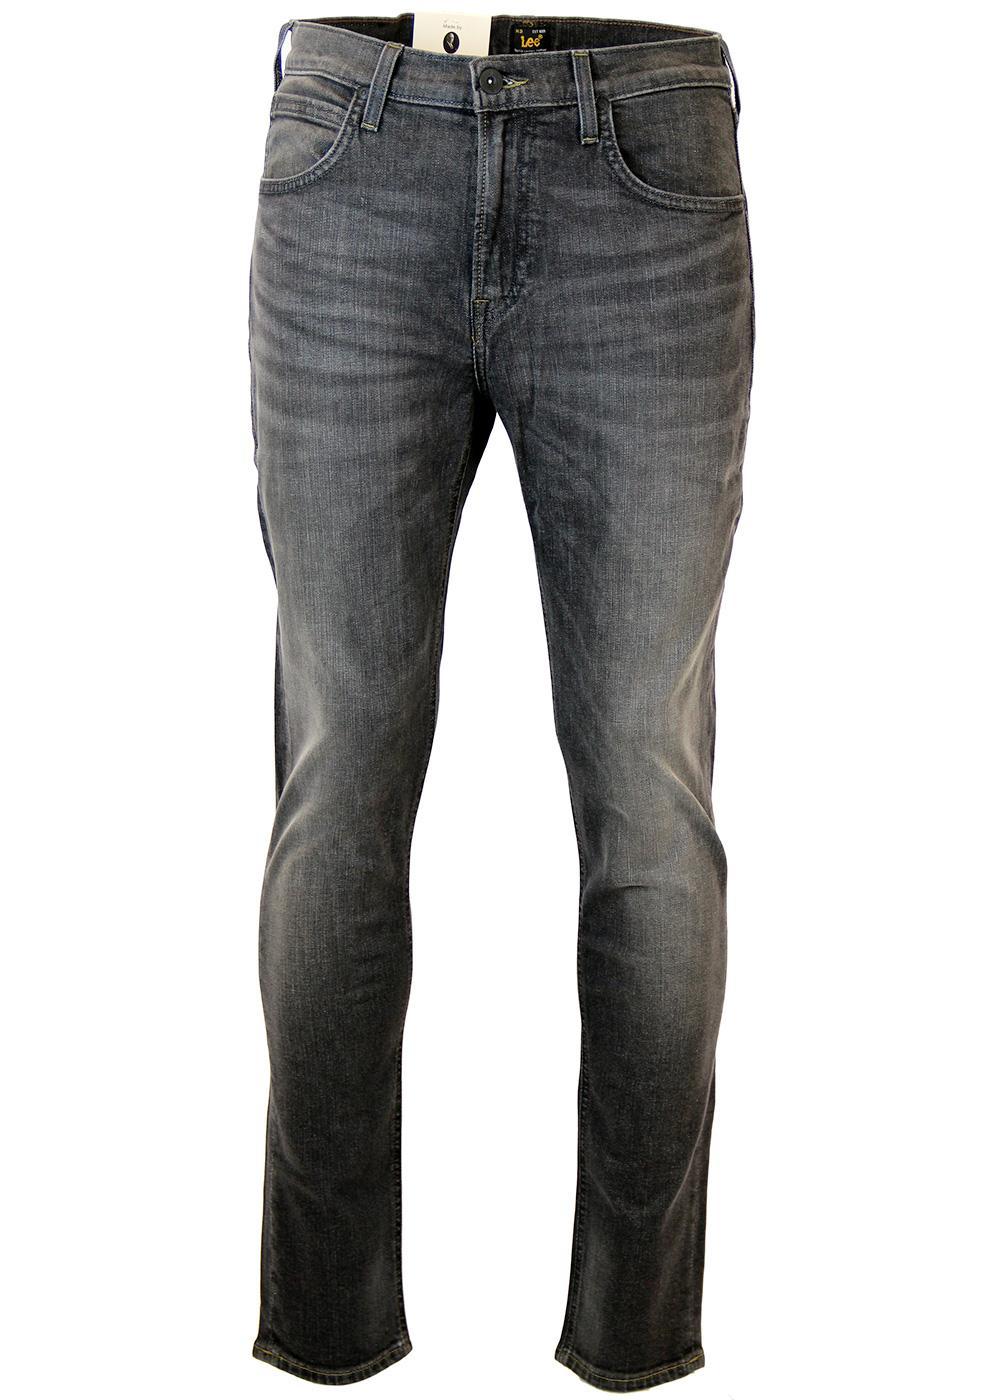 e820d70d LEE Arvin Retro 70s Mod Grey Worn Denim Regular Tapered Jeans